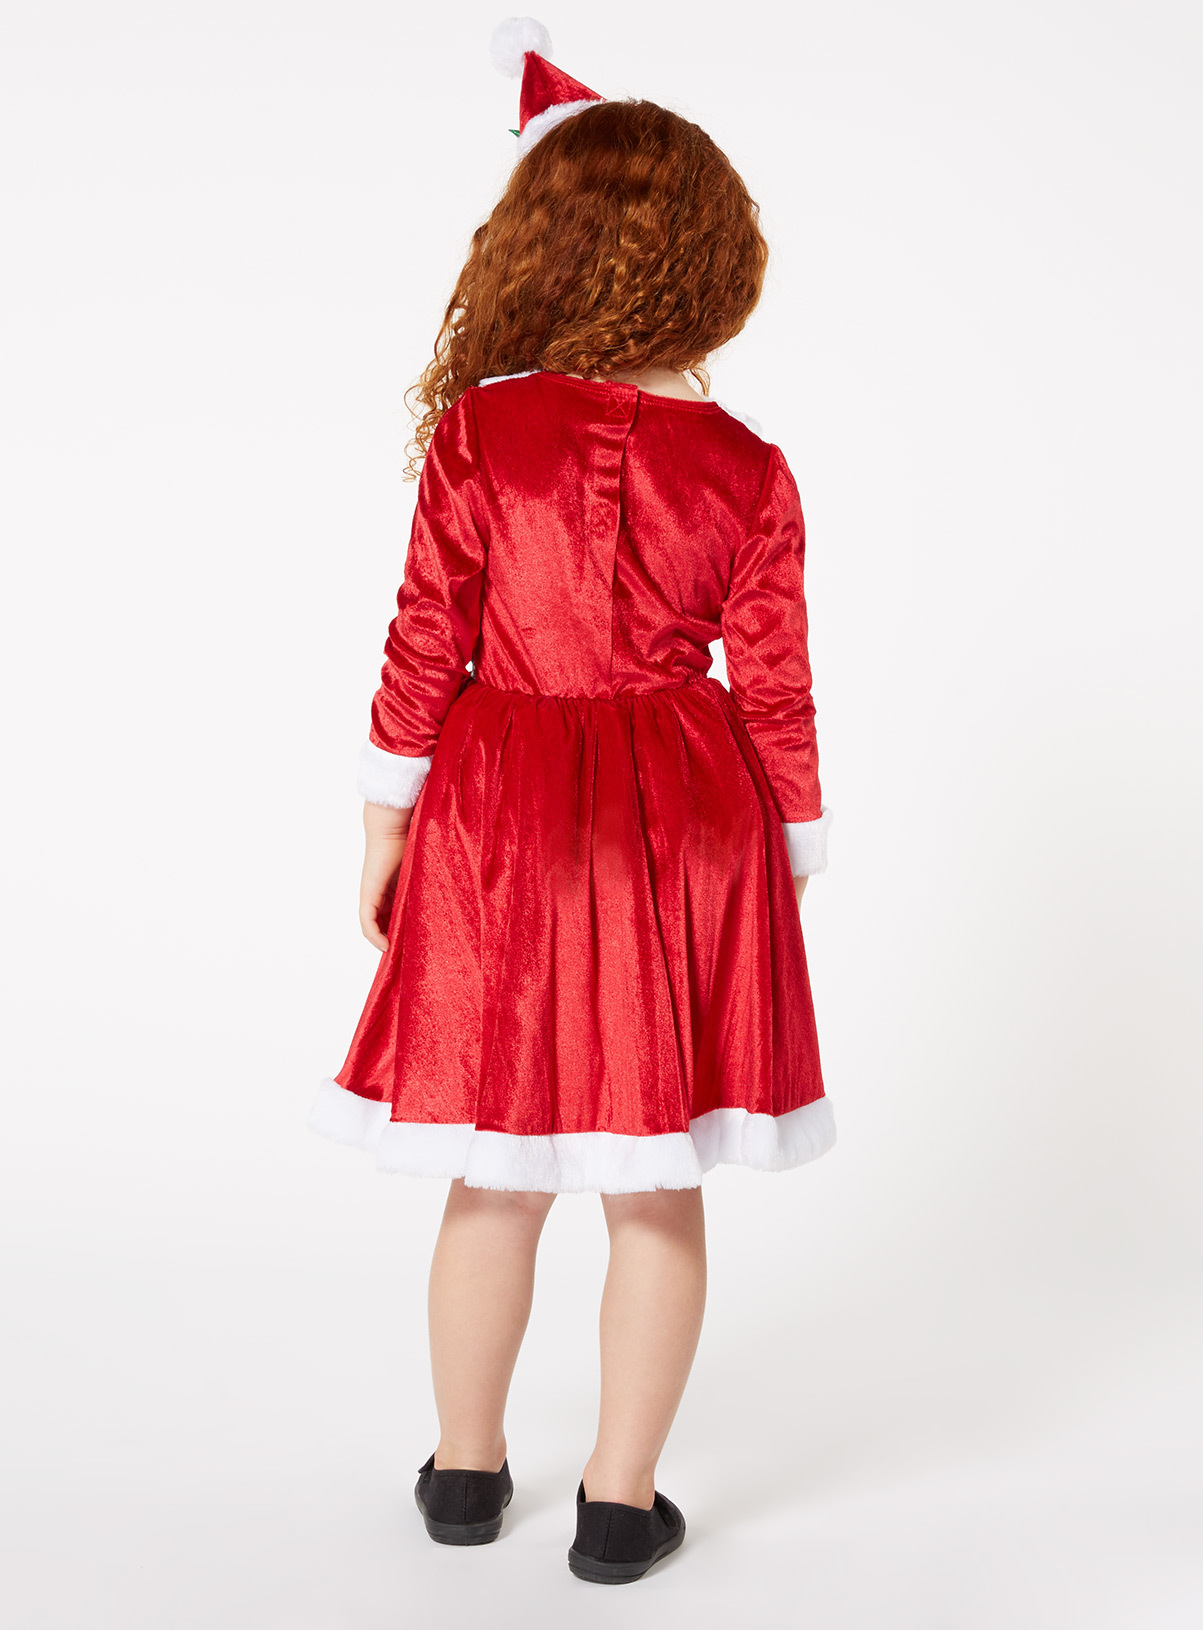 Fancy Dress Red Christmas Santa Dress Costume (1-10 years) | Tu ...